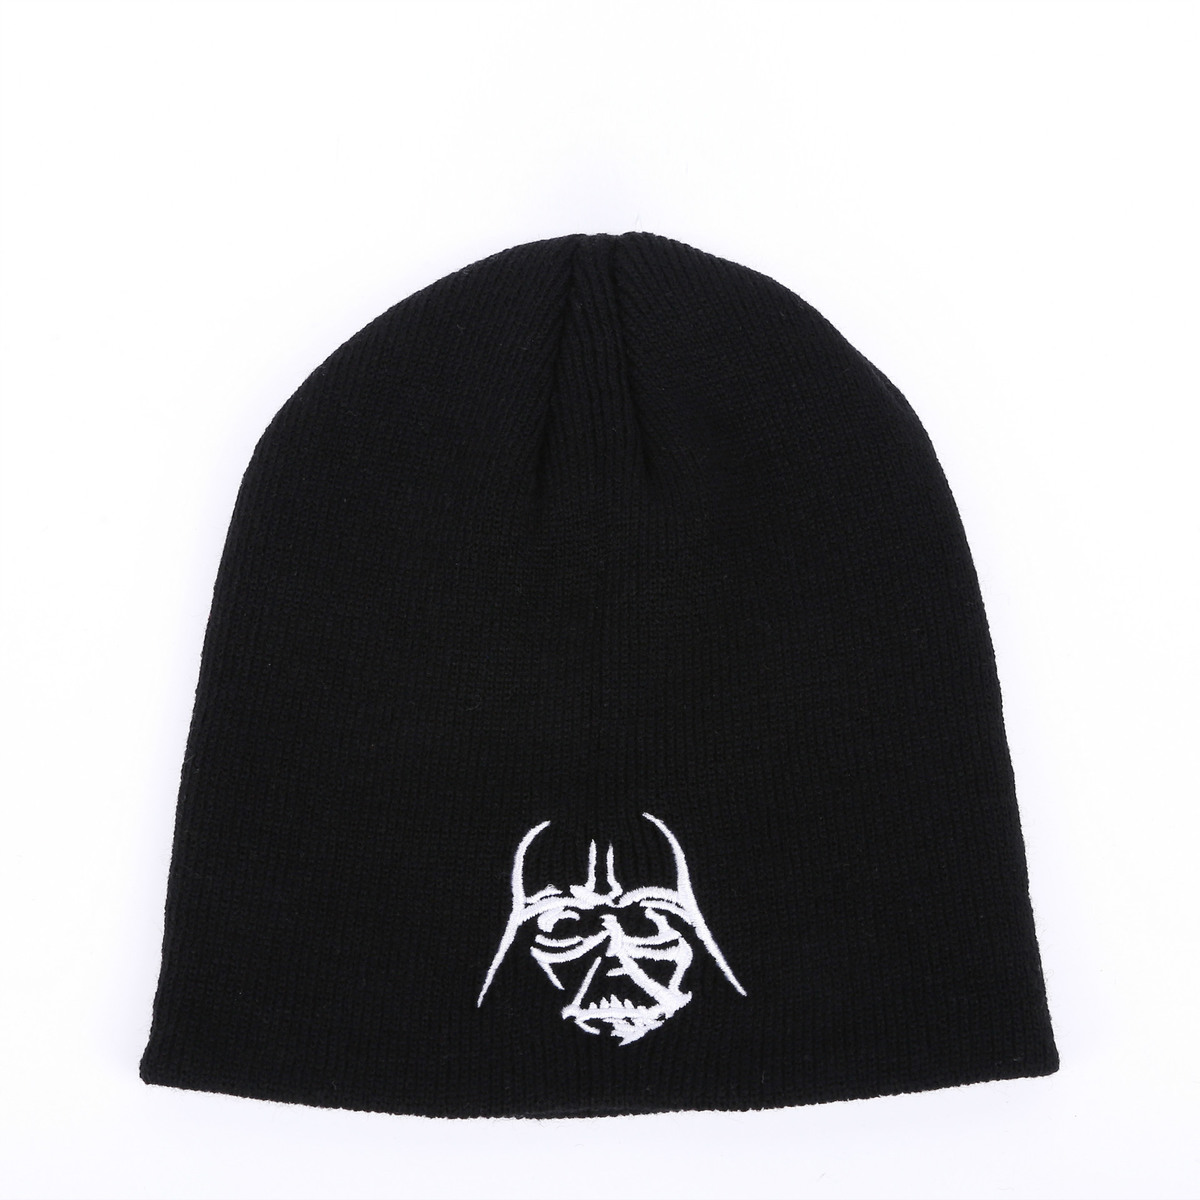 Trooper Star Wars Black Warrior Wool Knitting Hat Set Head Hats Keep Warm Cap For Men Women Autumn Winter Couple Caps Ski Beanie